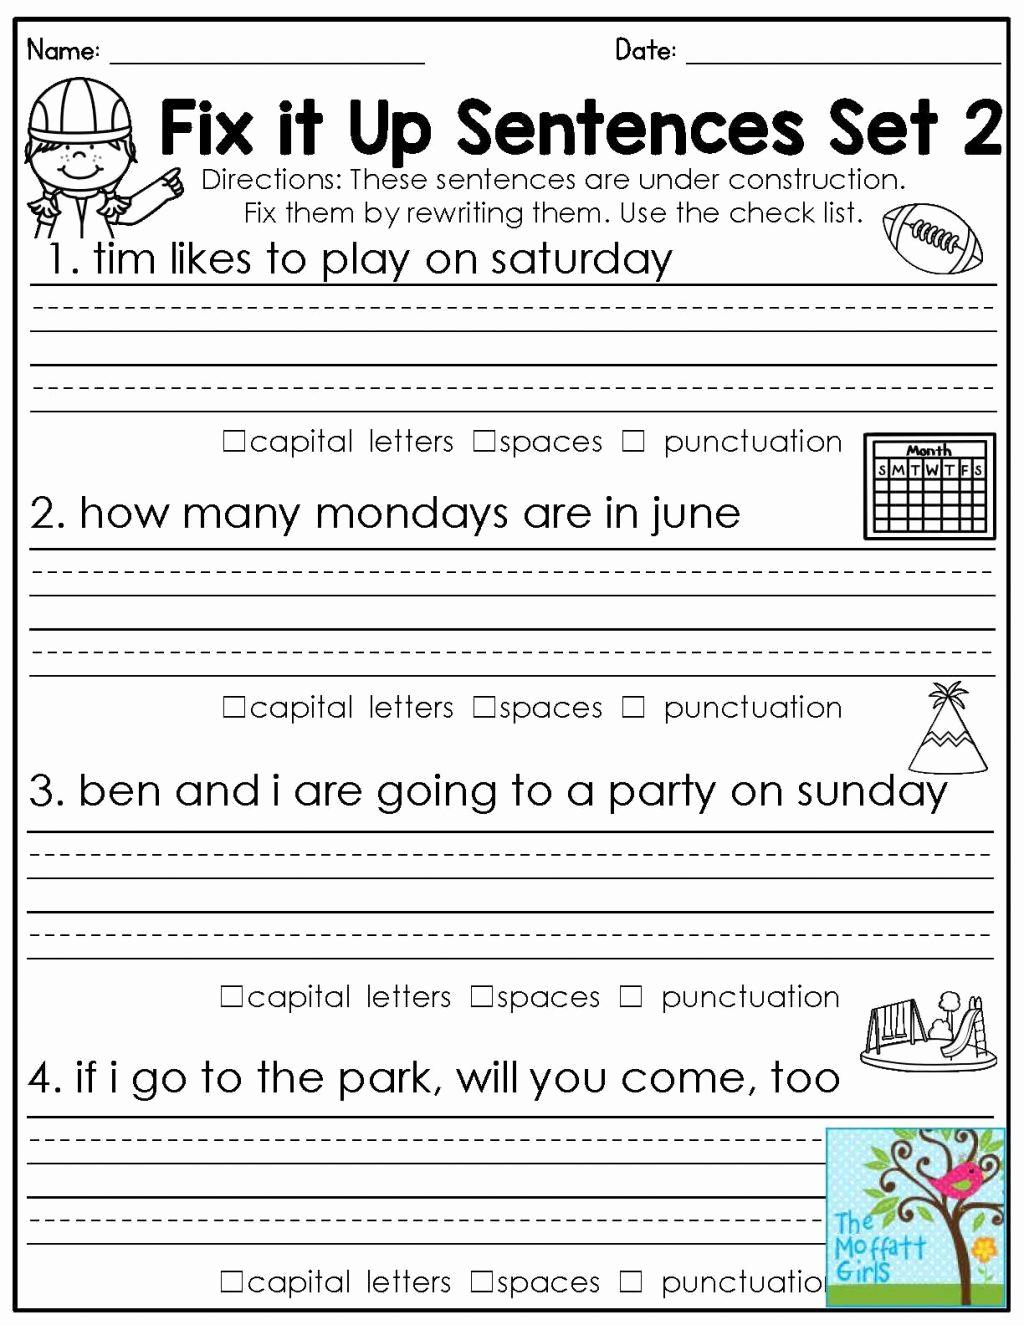 Proofreading Worksheets 3rd Grade Unique 20 Third Grade Grammar Worksheet